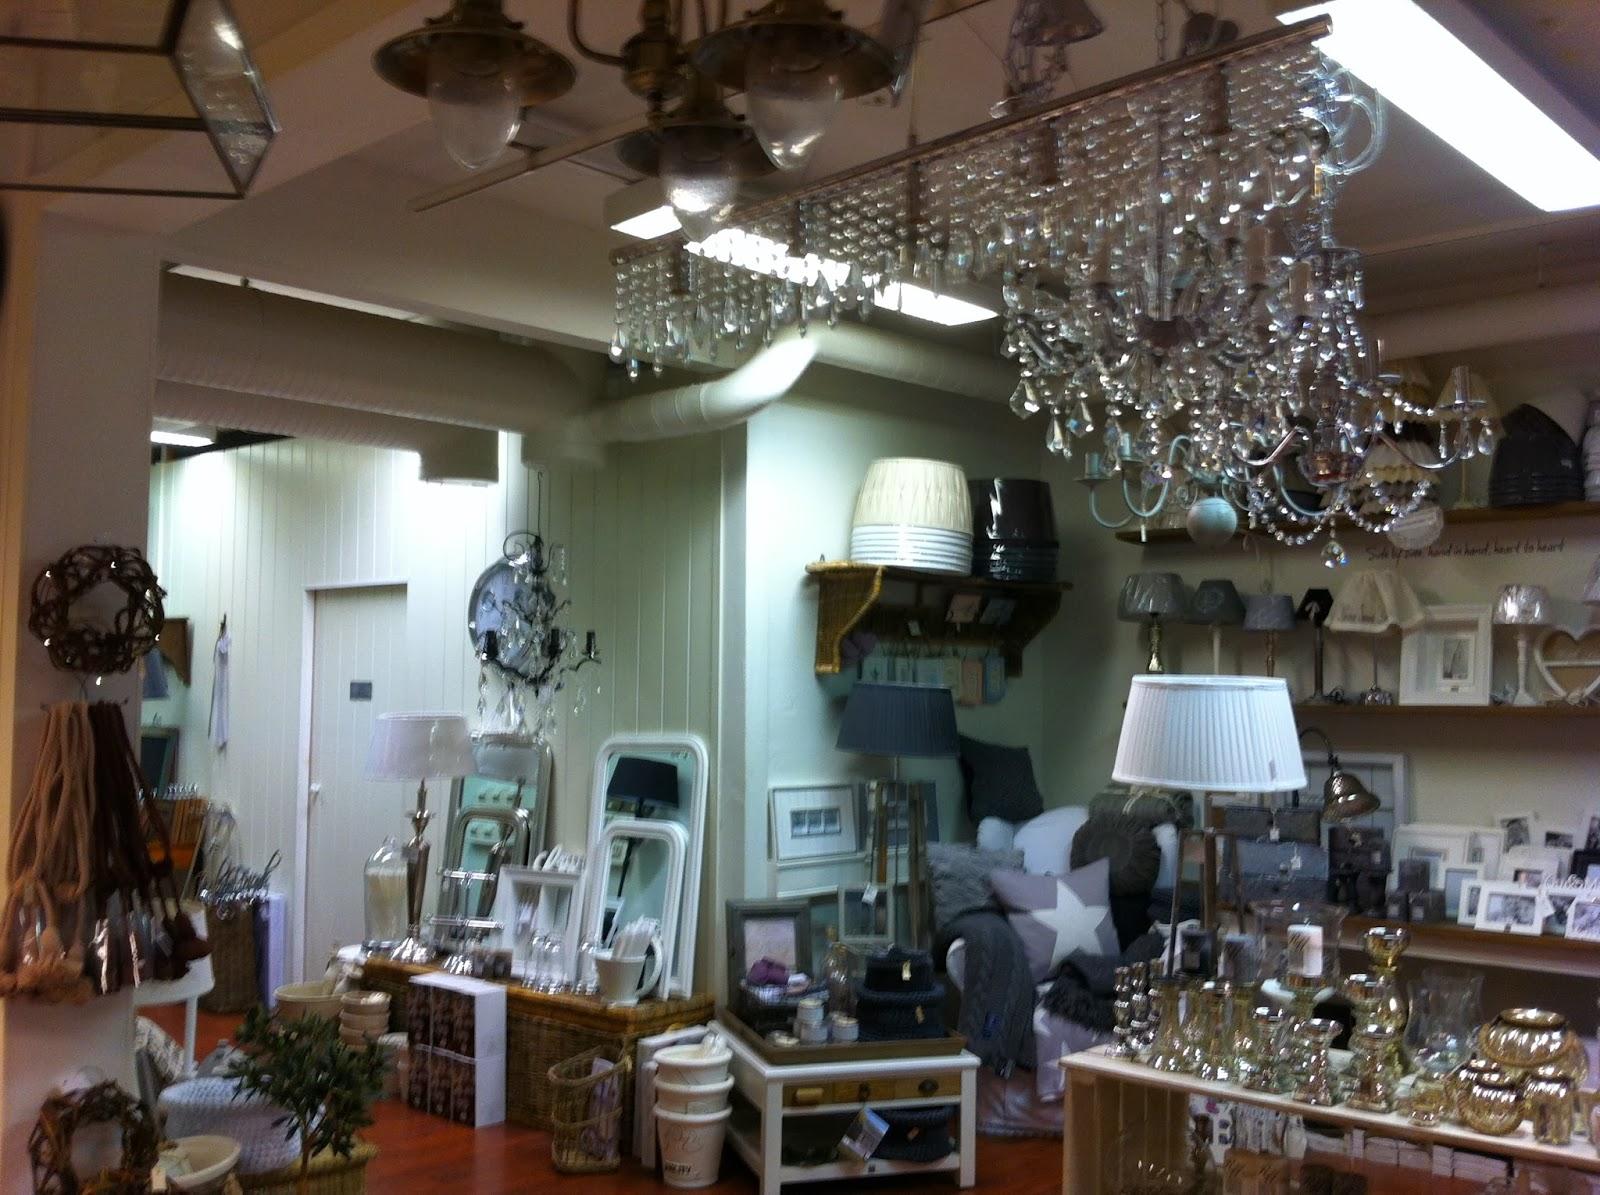 Sisustusliike K & K Lappeenrannassa – The decor store K & K